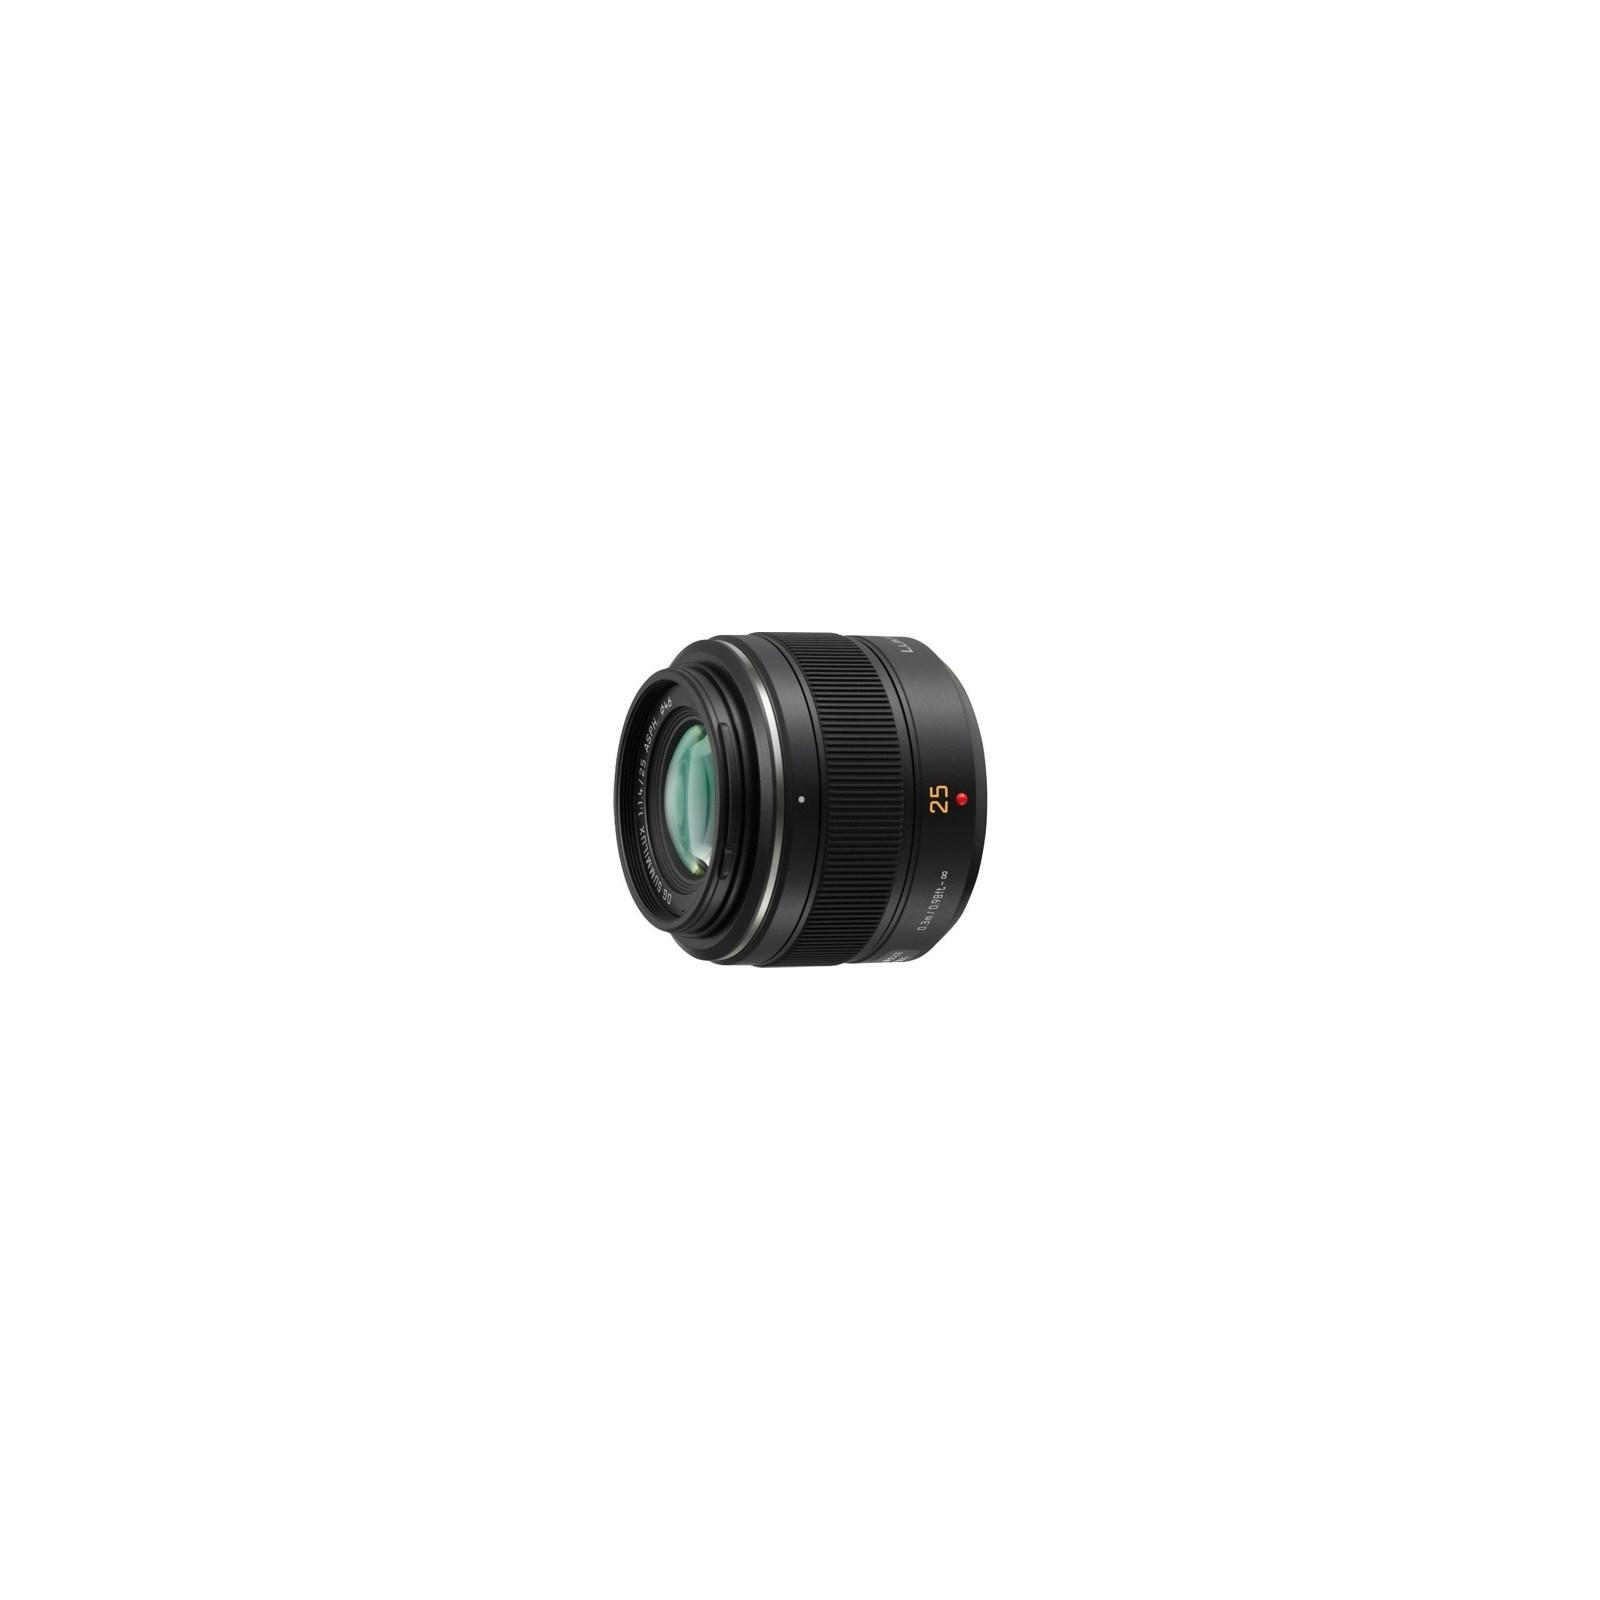 Объектив PANASONIC Leica DG Summilux 25mm f/1.4 ASPH (H-X025E)